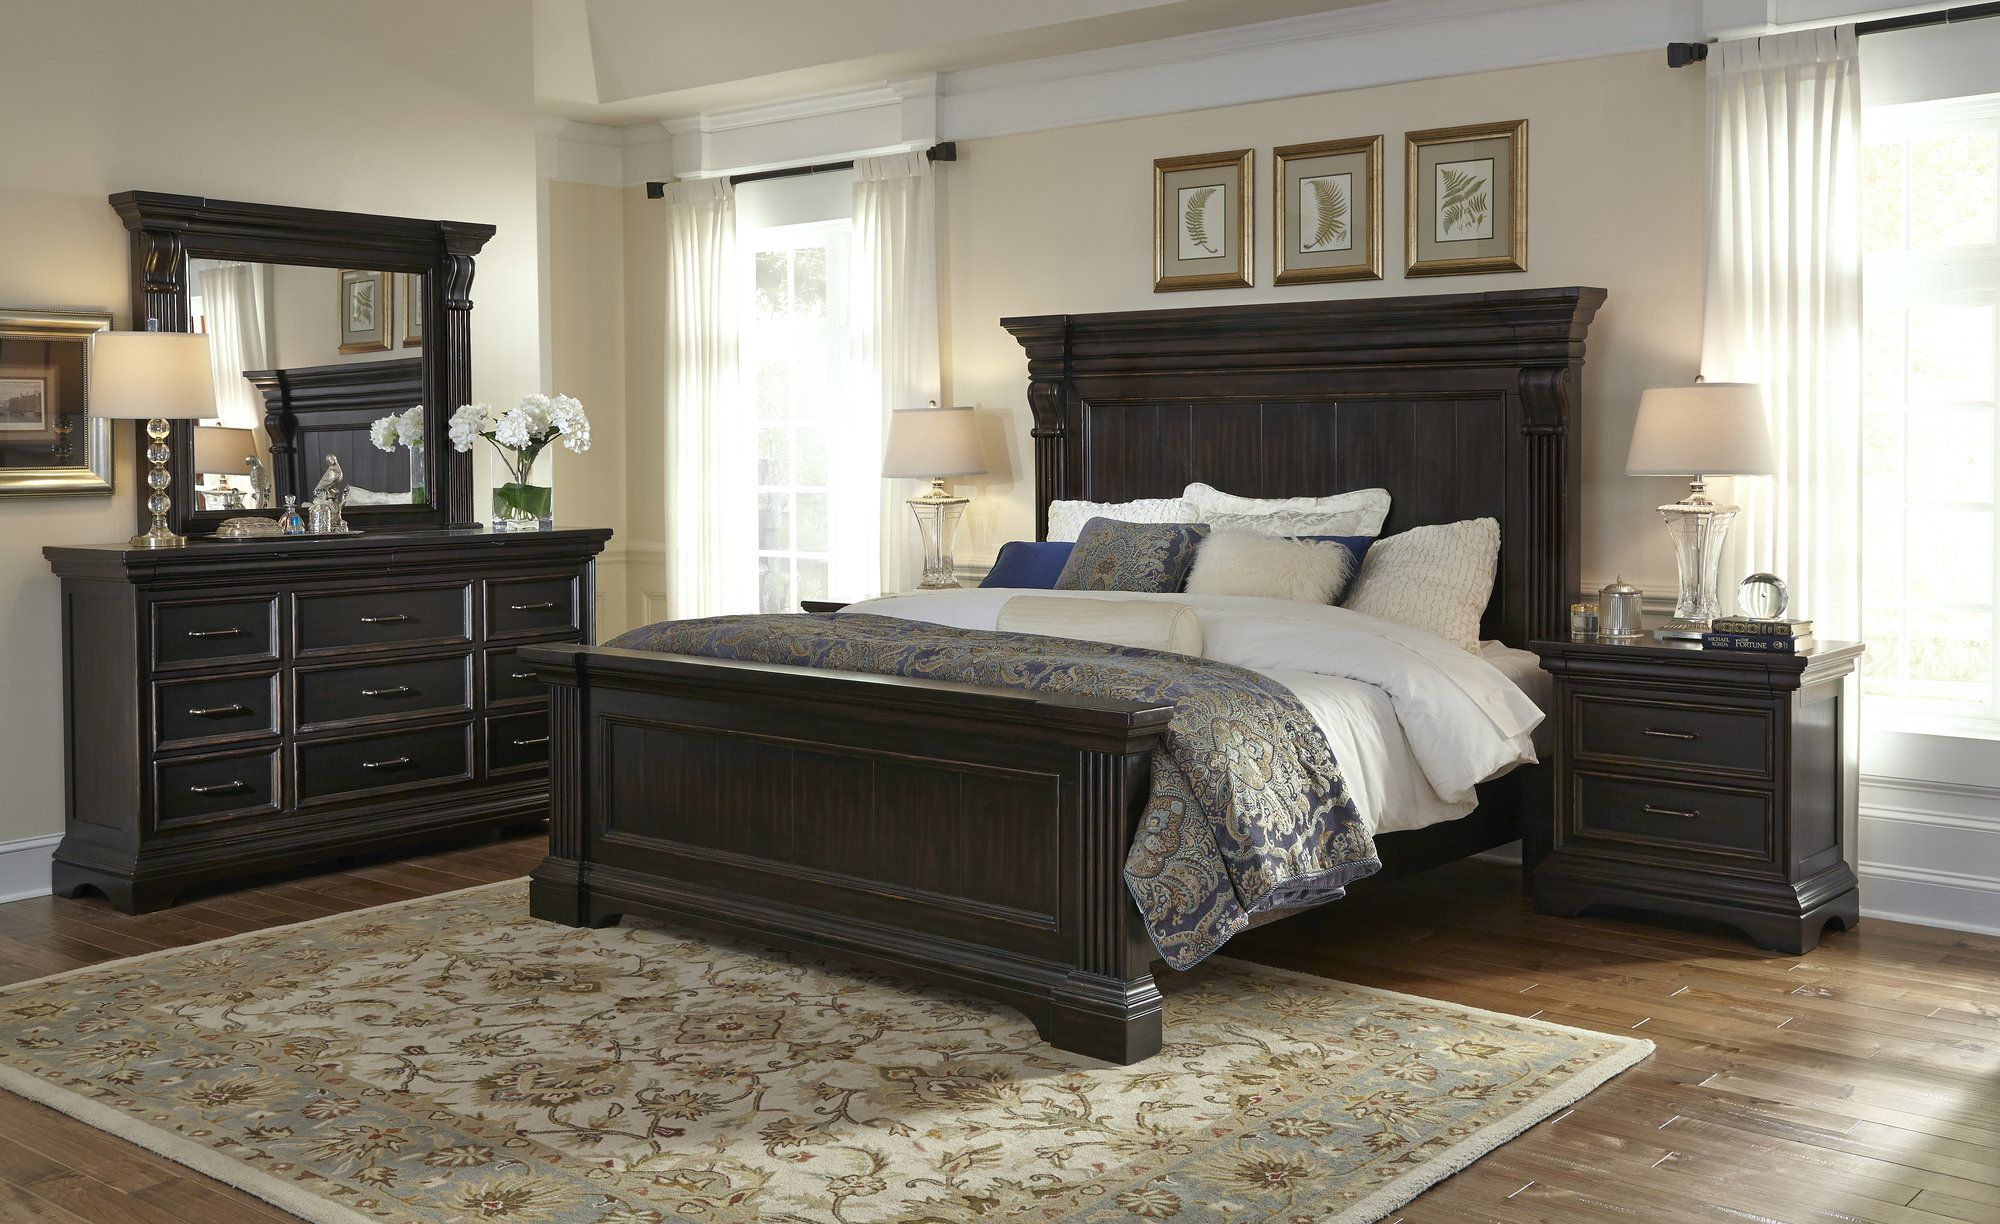 Glencoe 2 Drawer Nightstand King bedroom sets, Bedroom